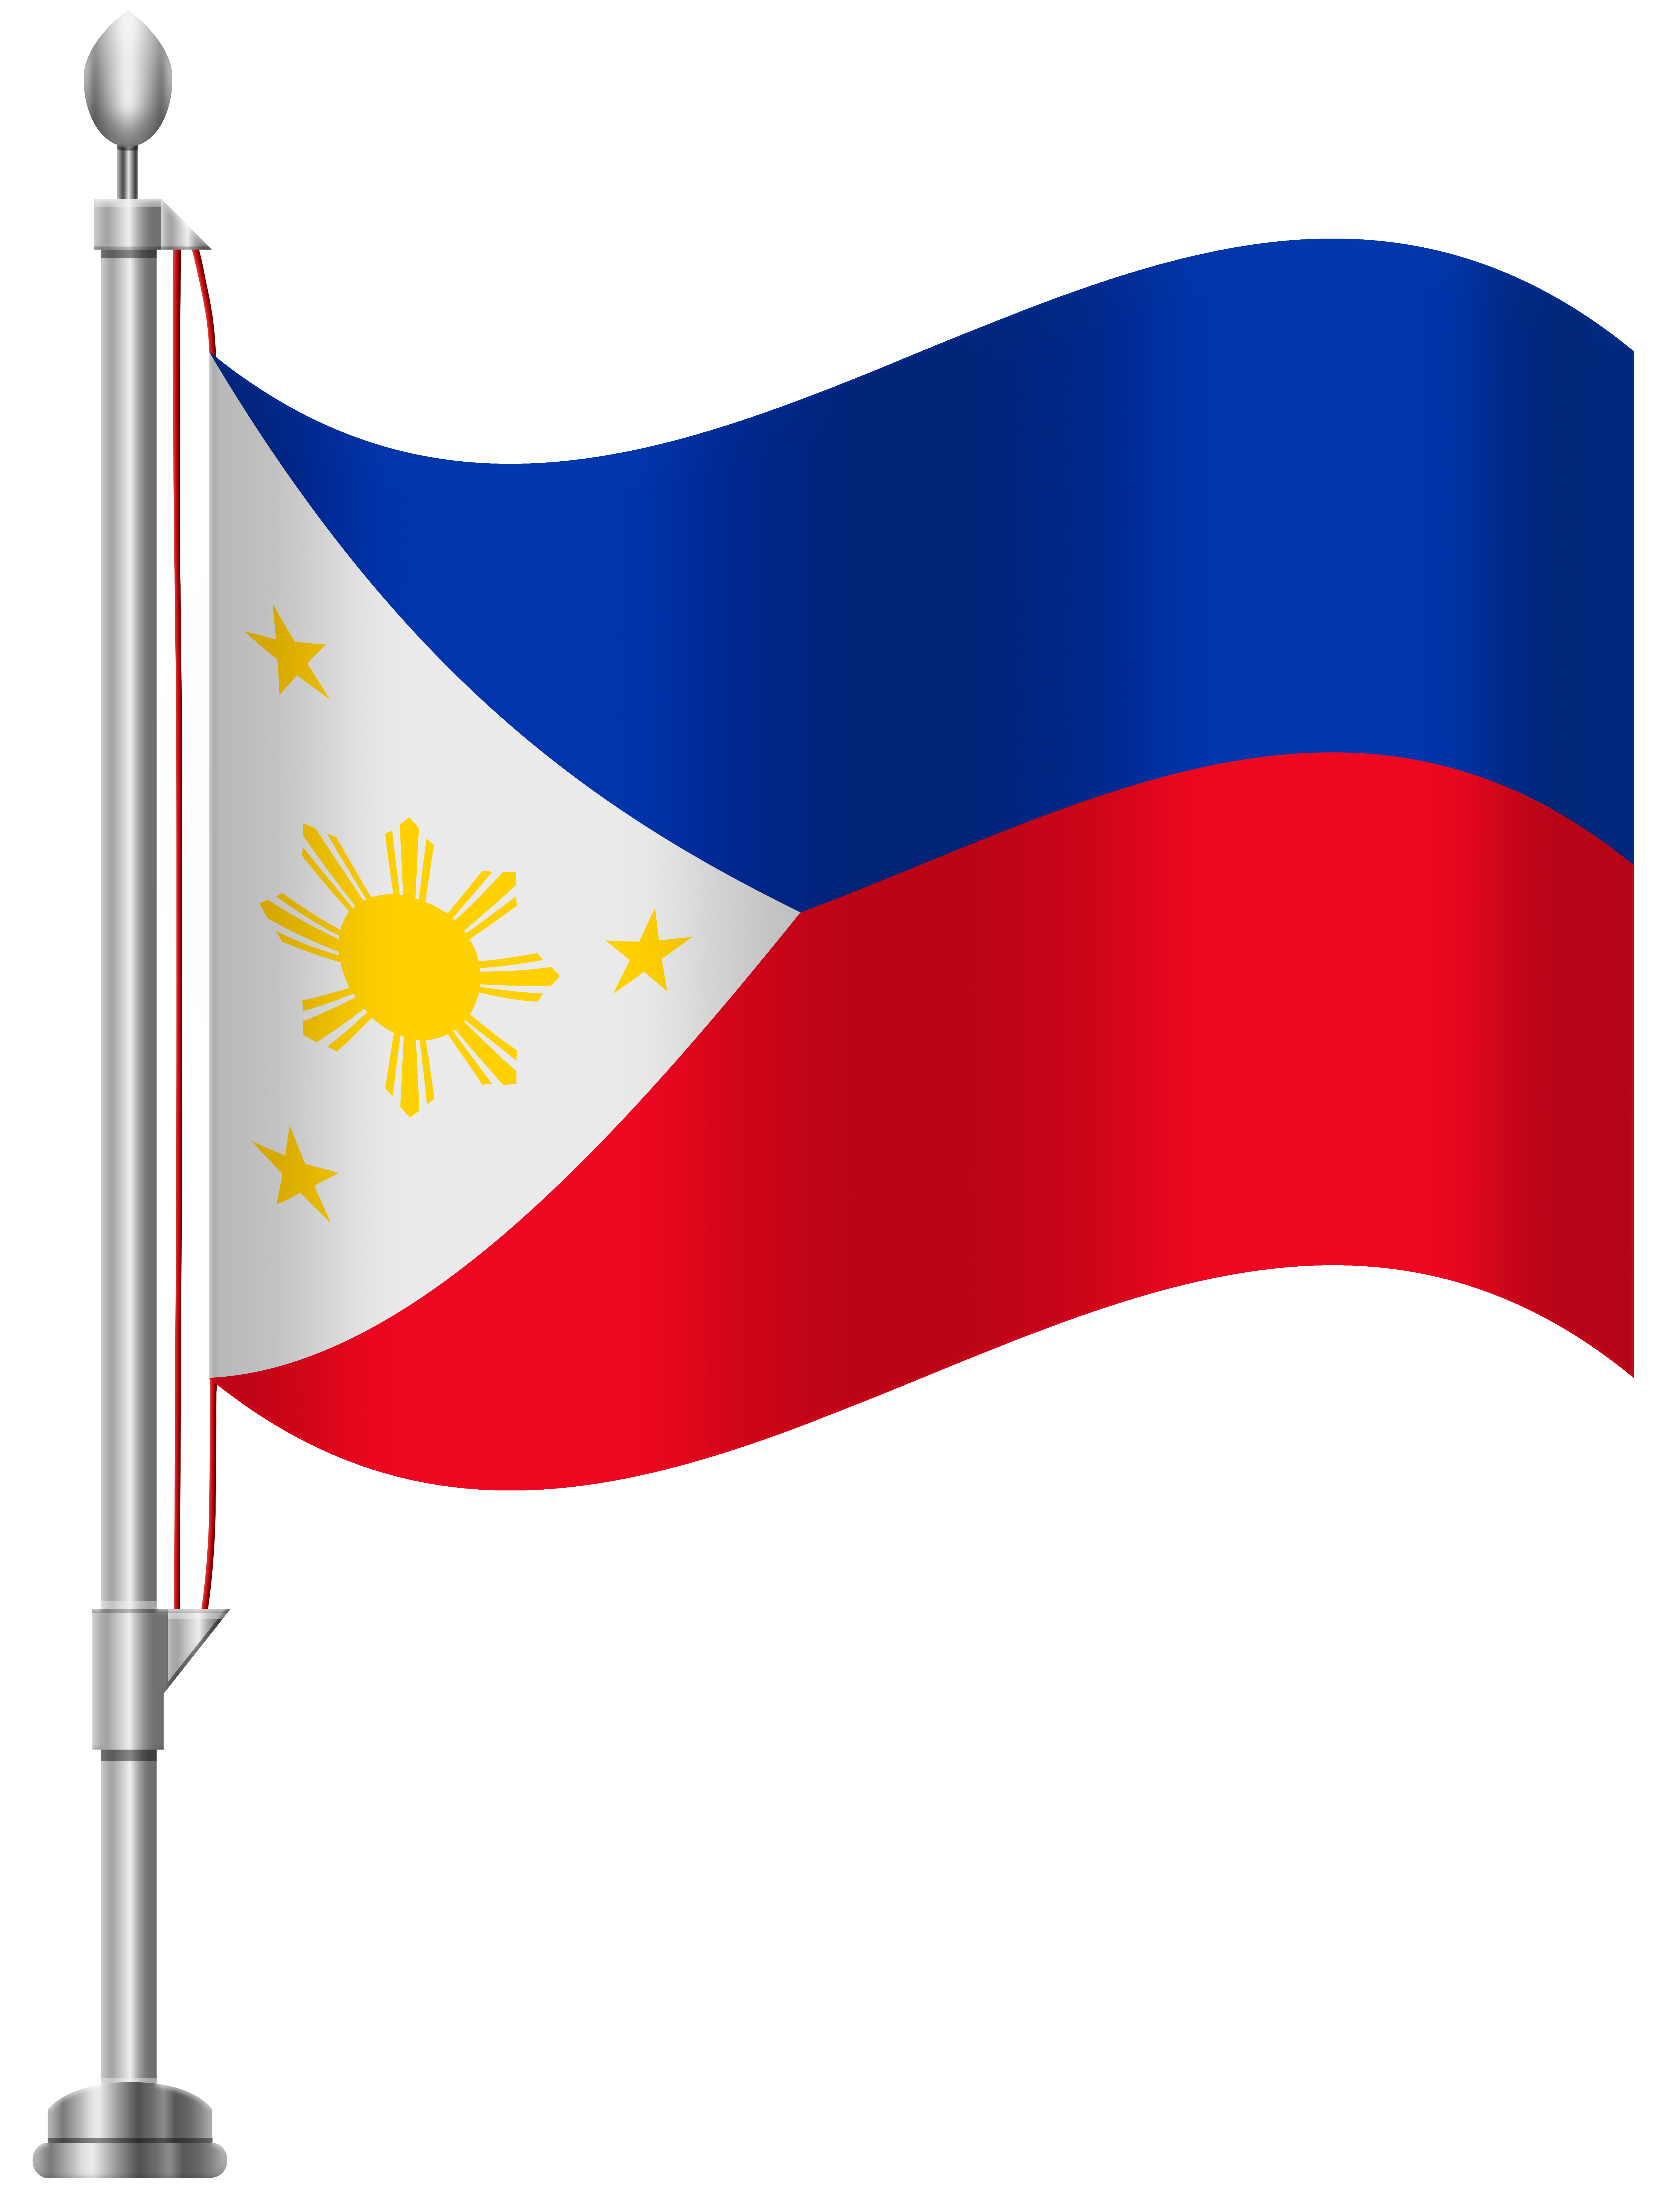 6141x8000 Clipart Standard Flags